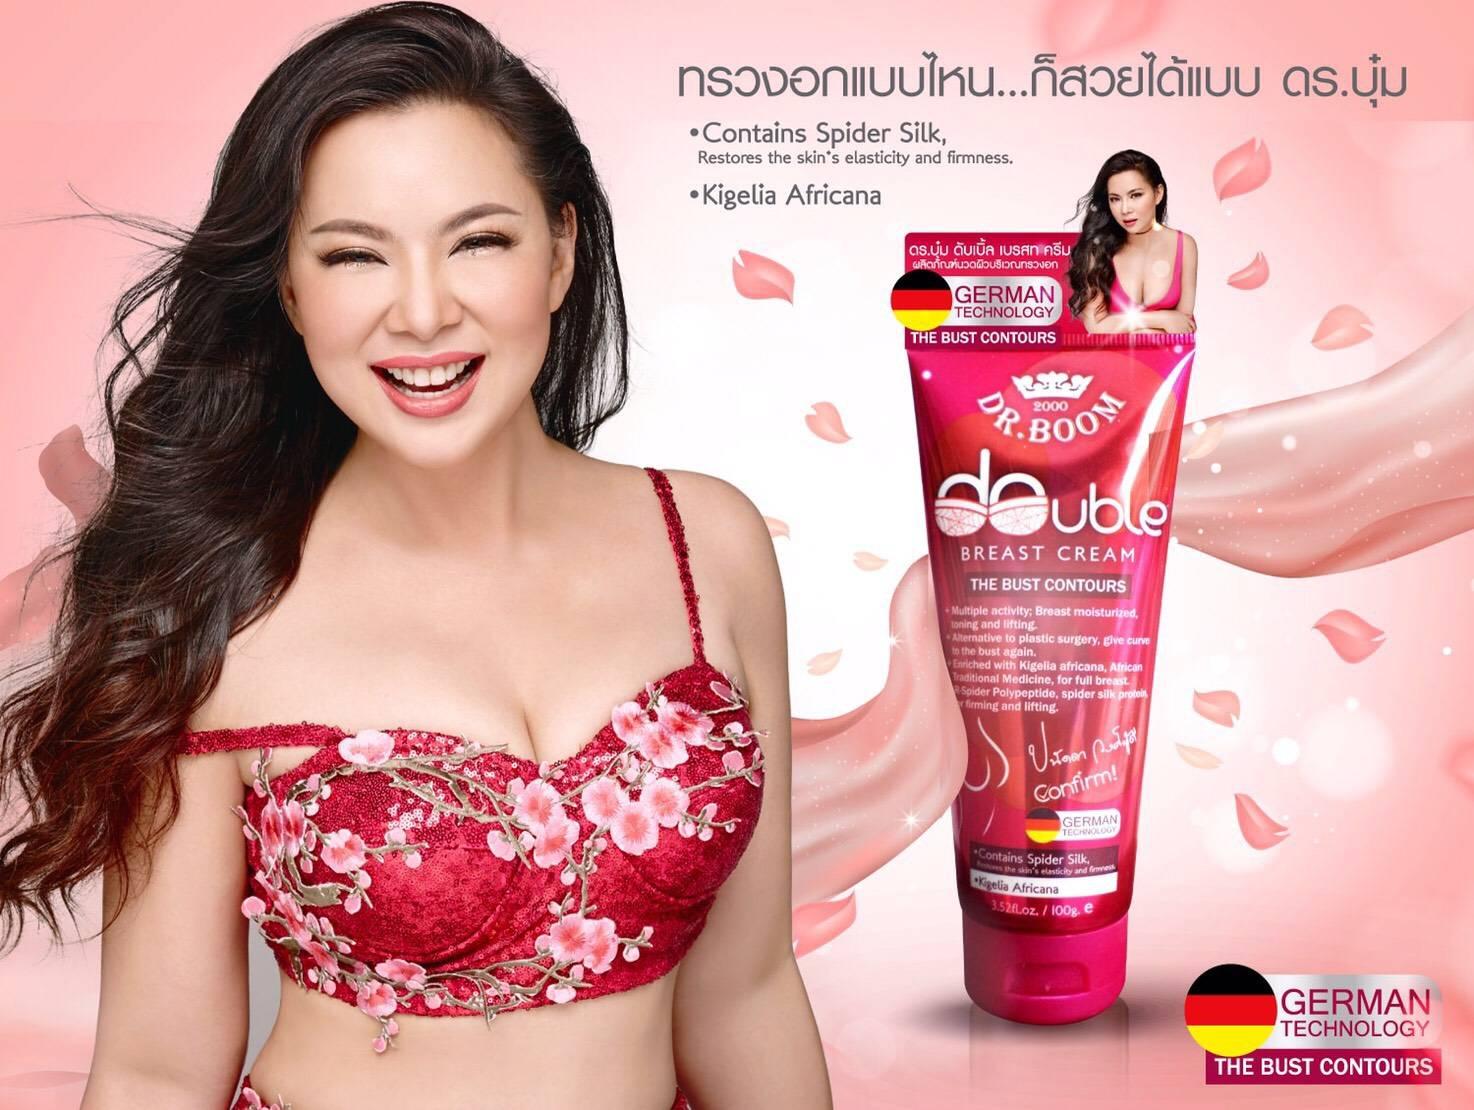 Dr.Boom Double Breast Cream ครีมนมใหญ่